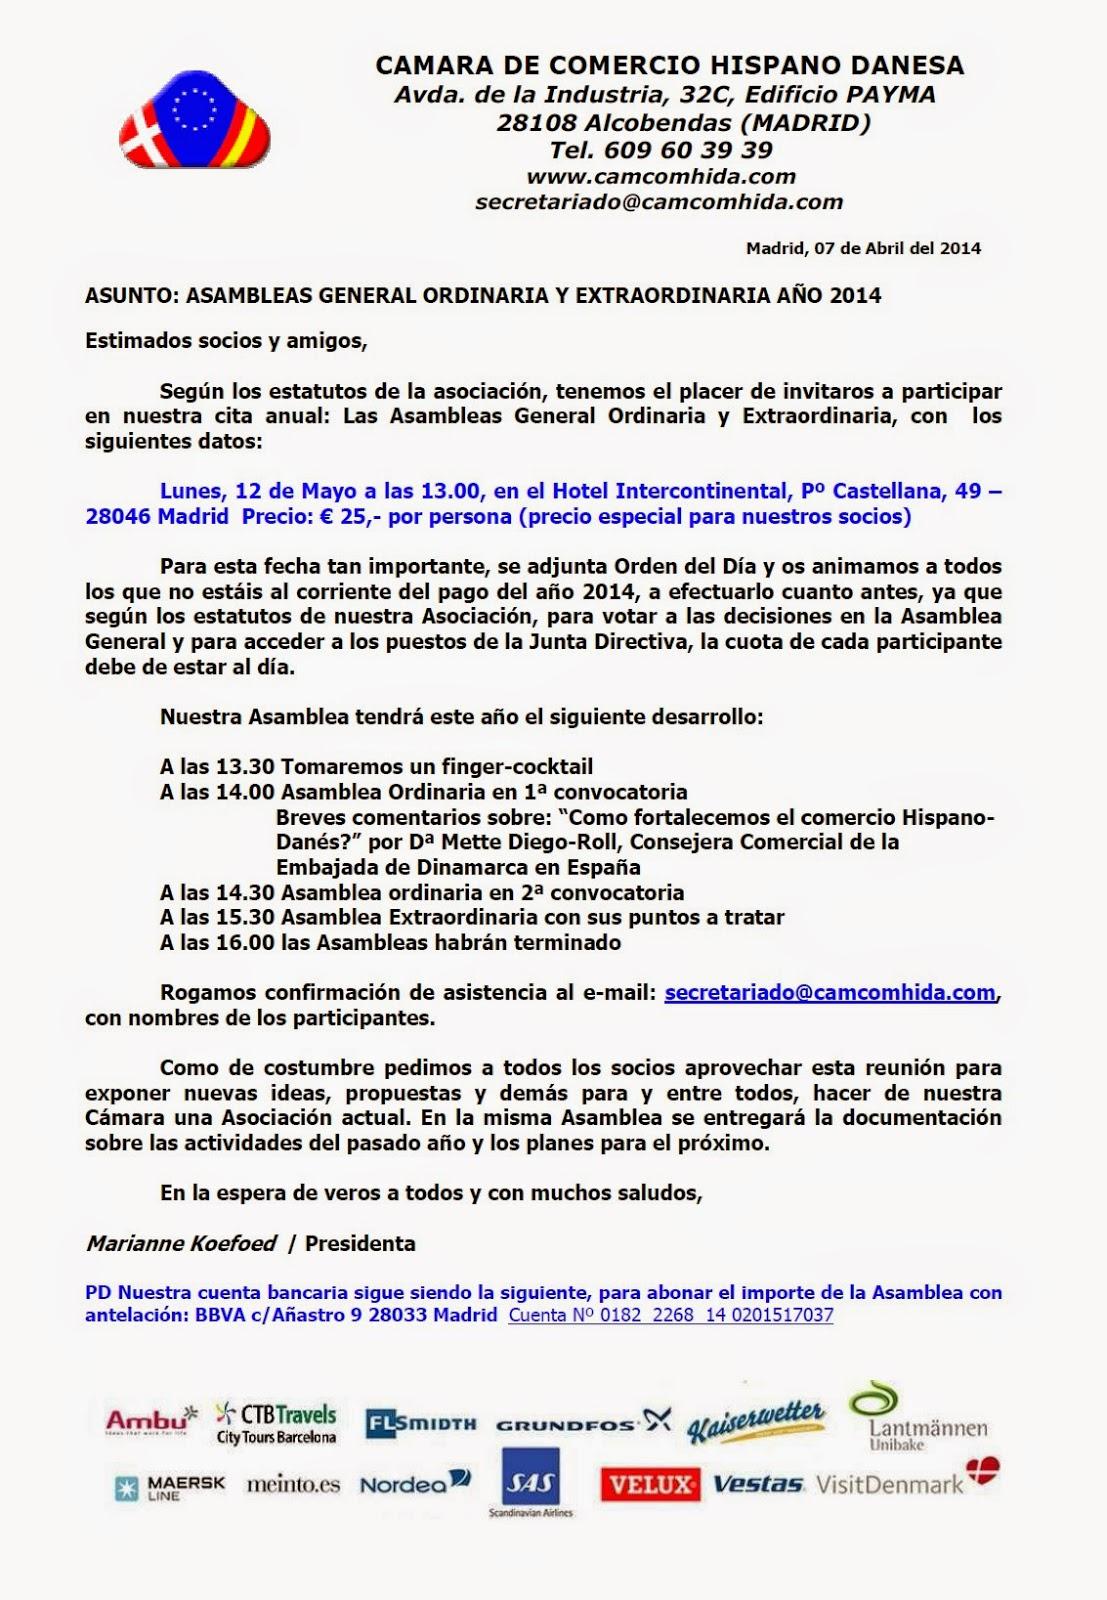 CamaraDanesaCartaAsambleaGeneral12Mayo2014